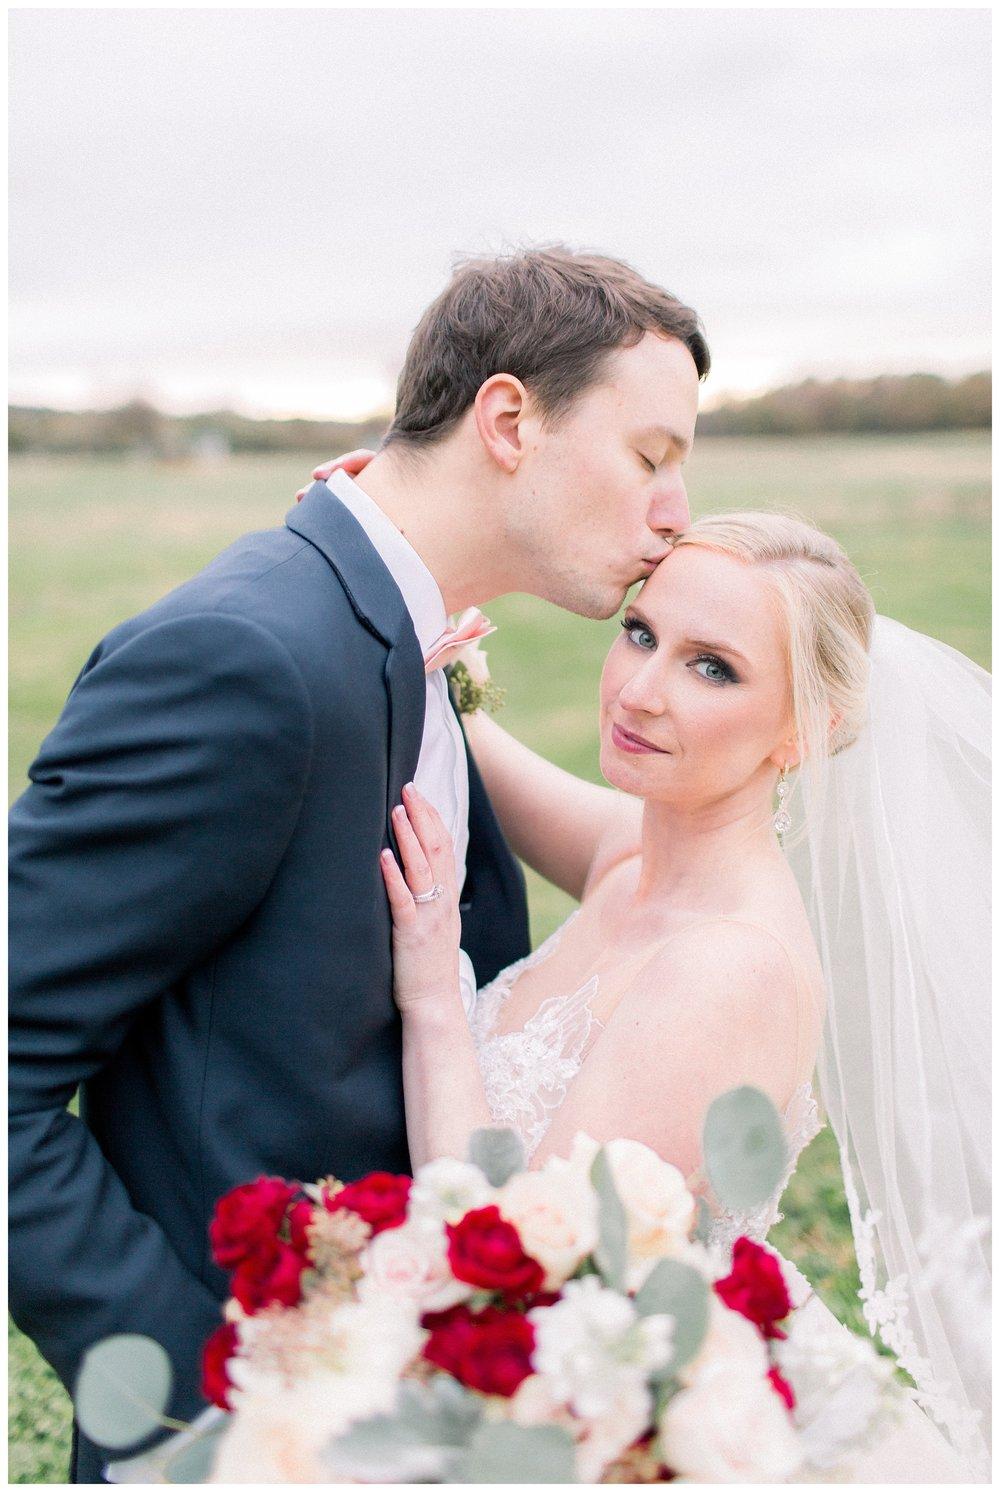 Whitehall Estate Wedding | Northern Virginia Wedding Photographer Kir Tuben_0085.jpg